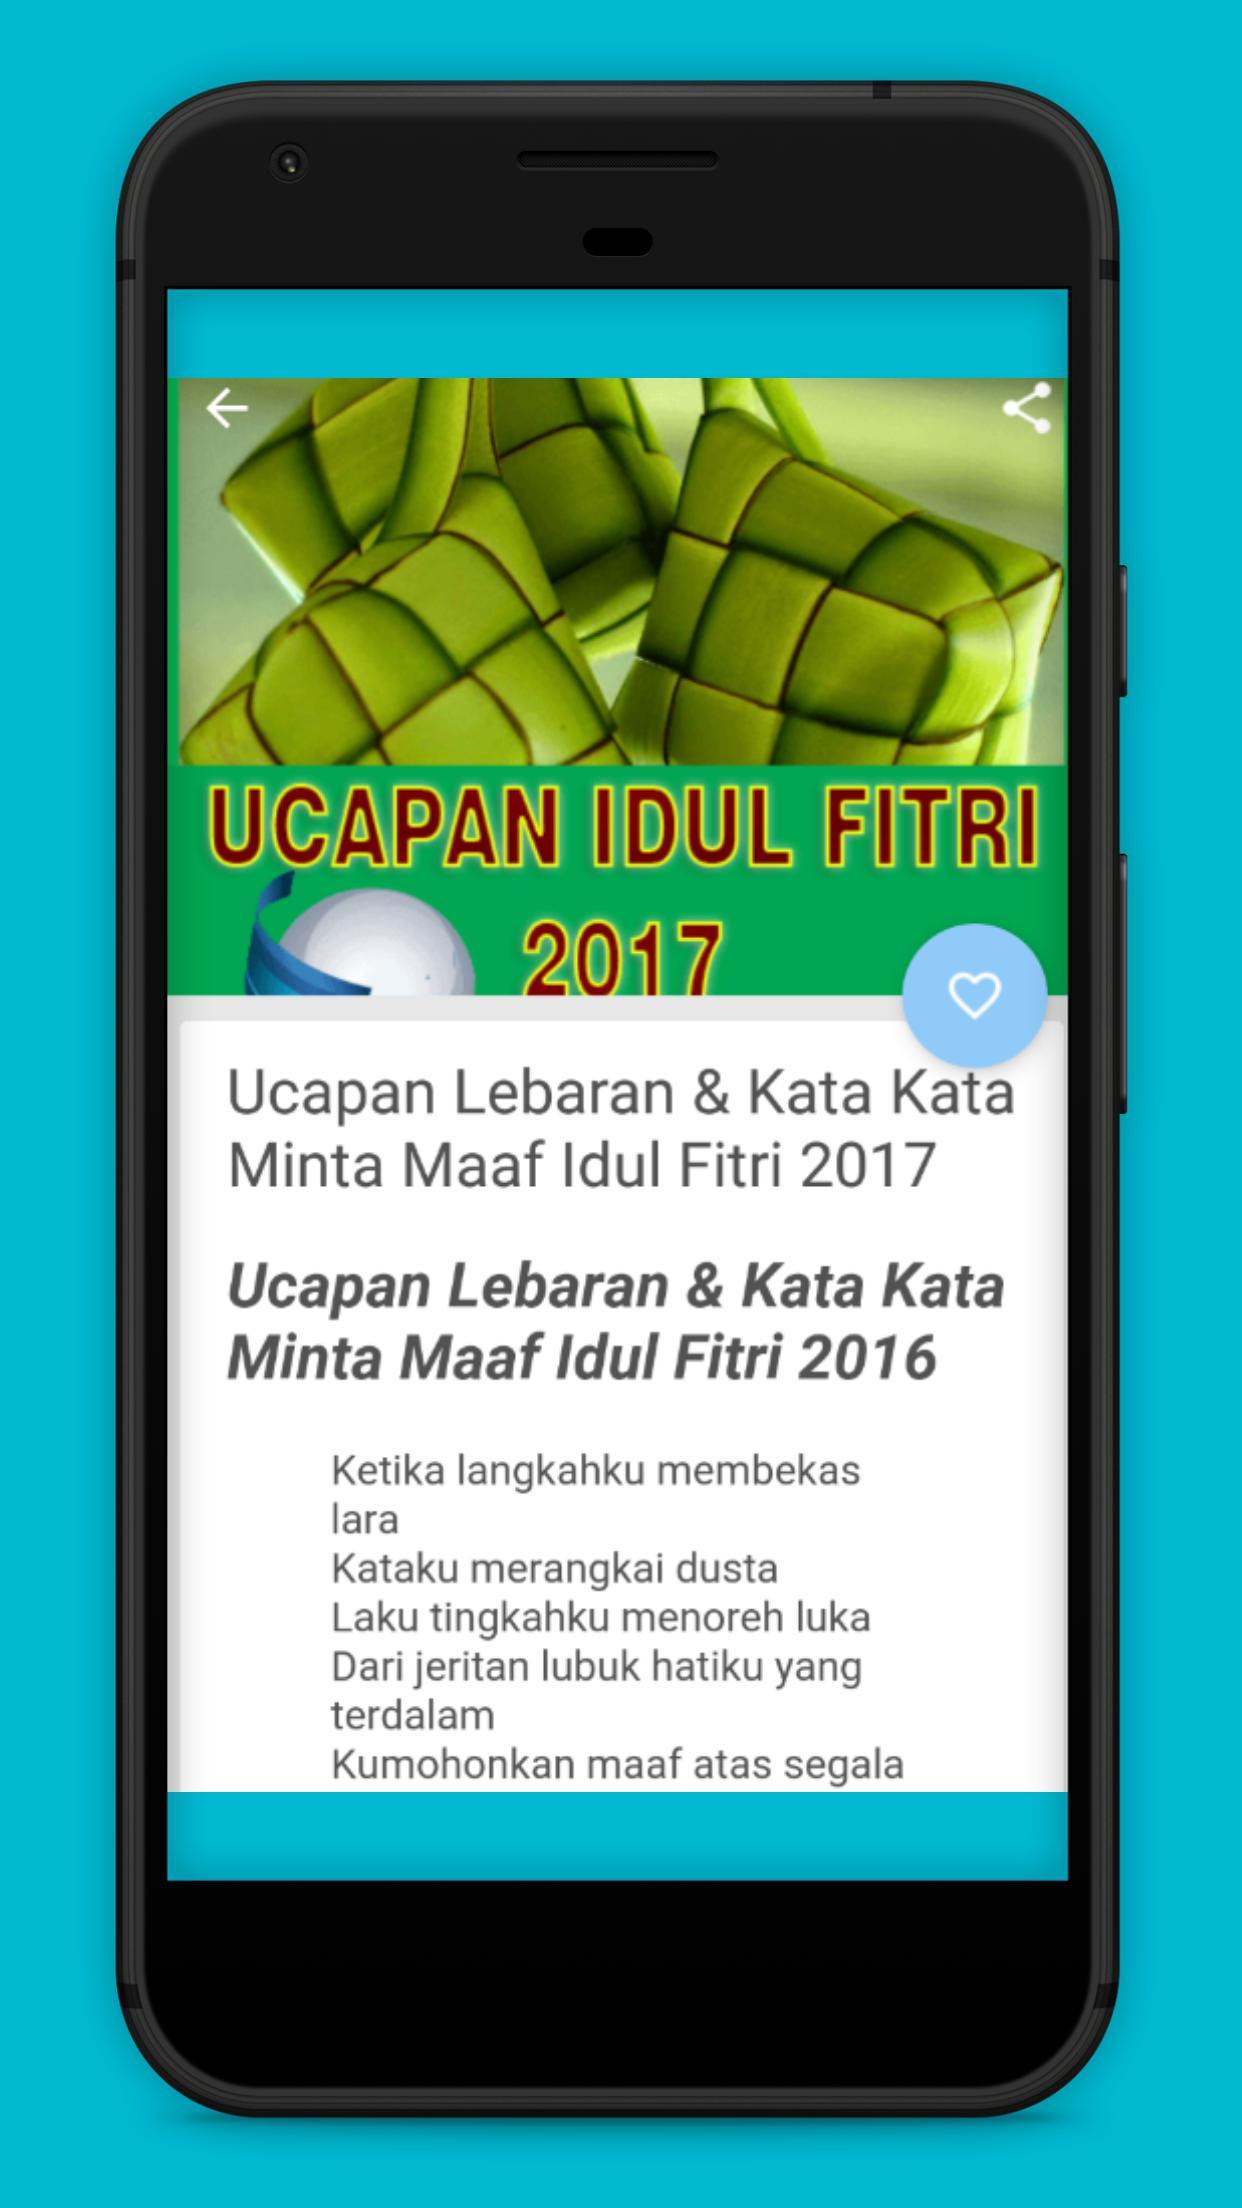 Ucapan Selamat Idul Fitri 2019 Für Android Apk Herunterladen